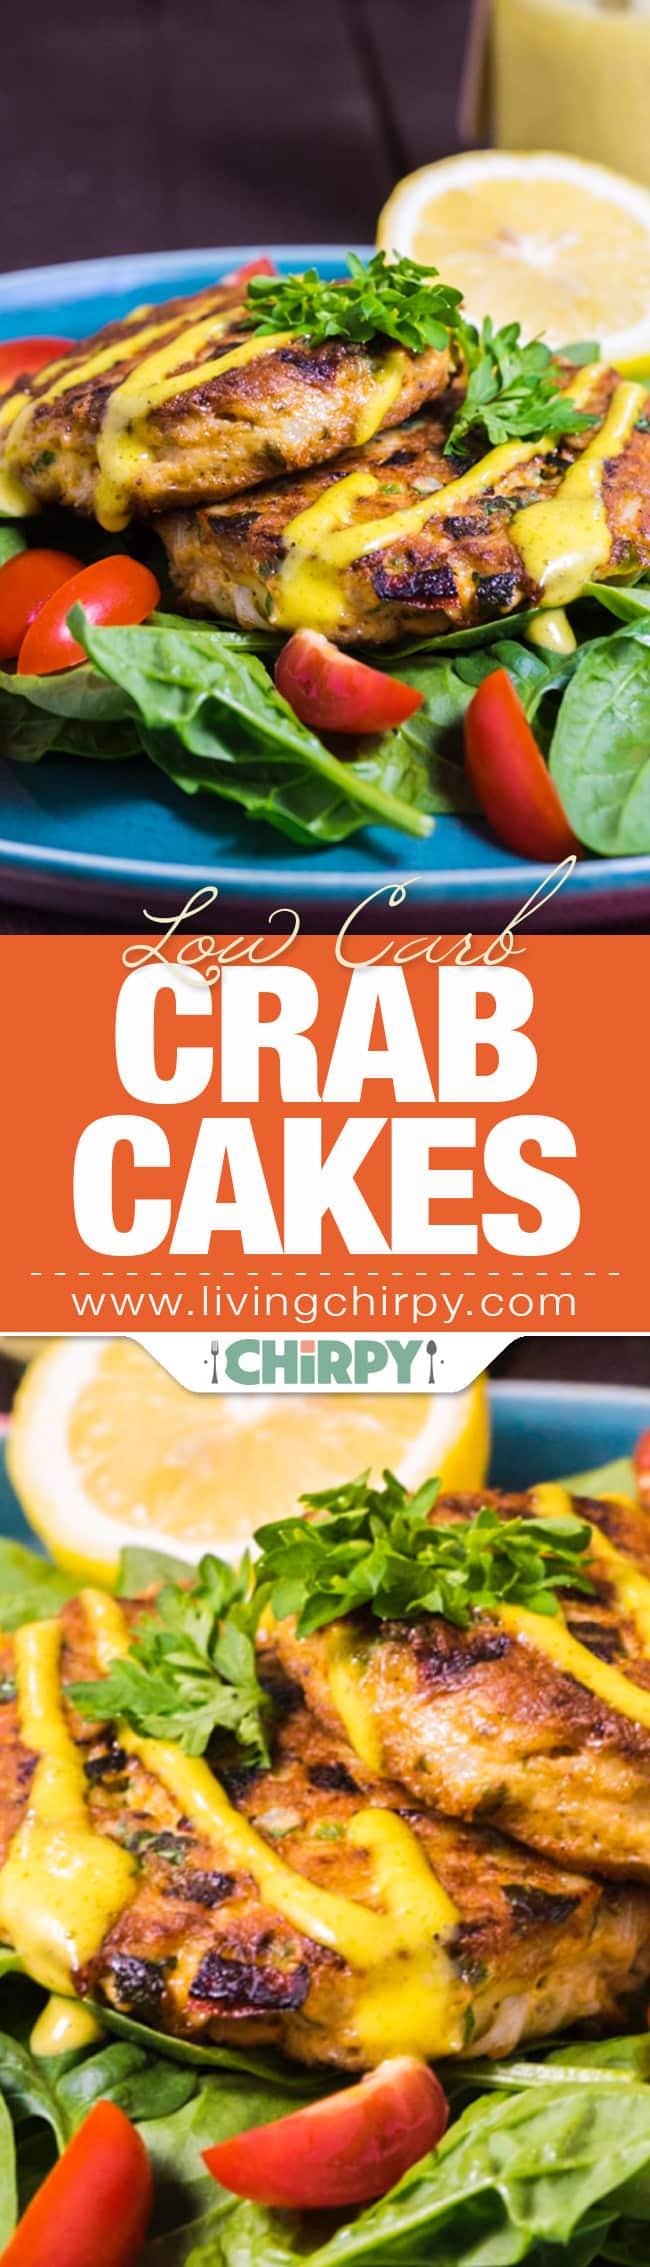 Low Carb Crab Cakes